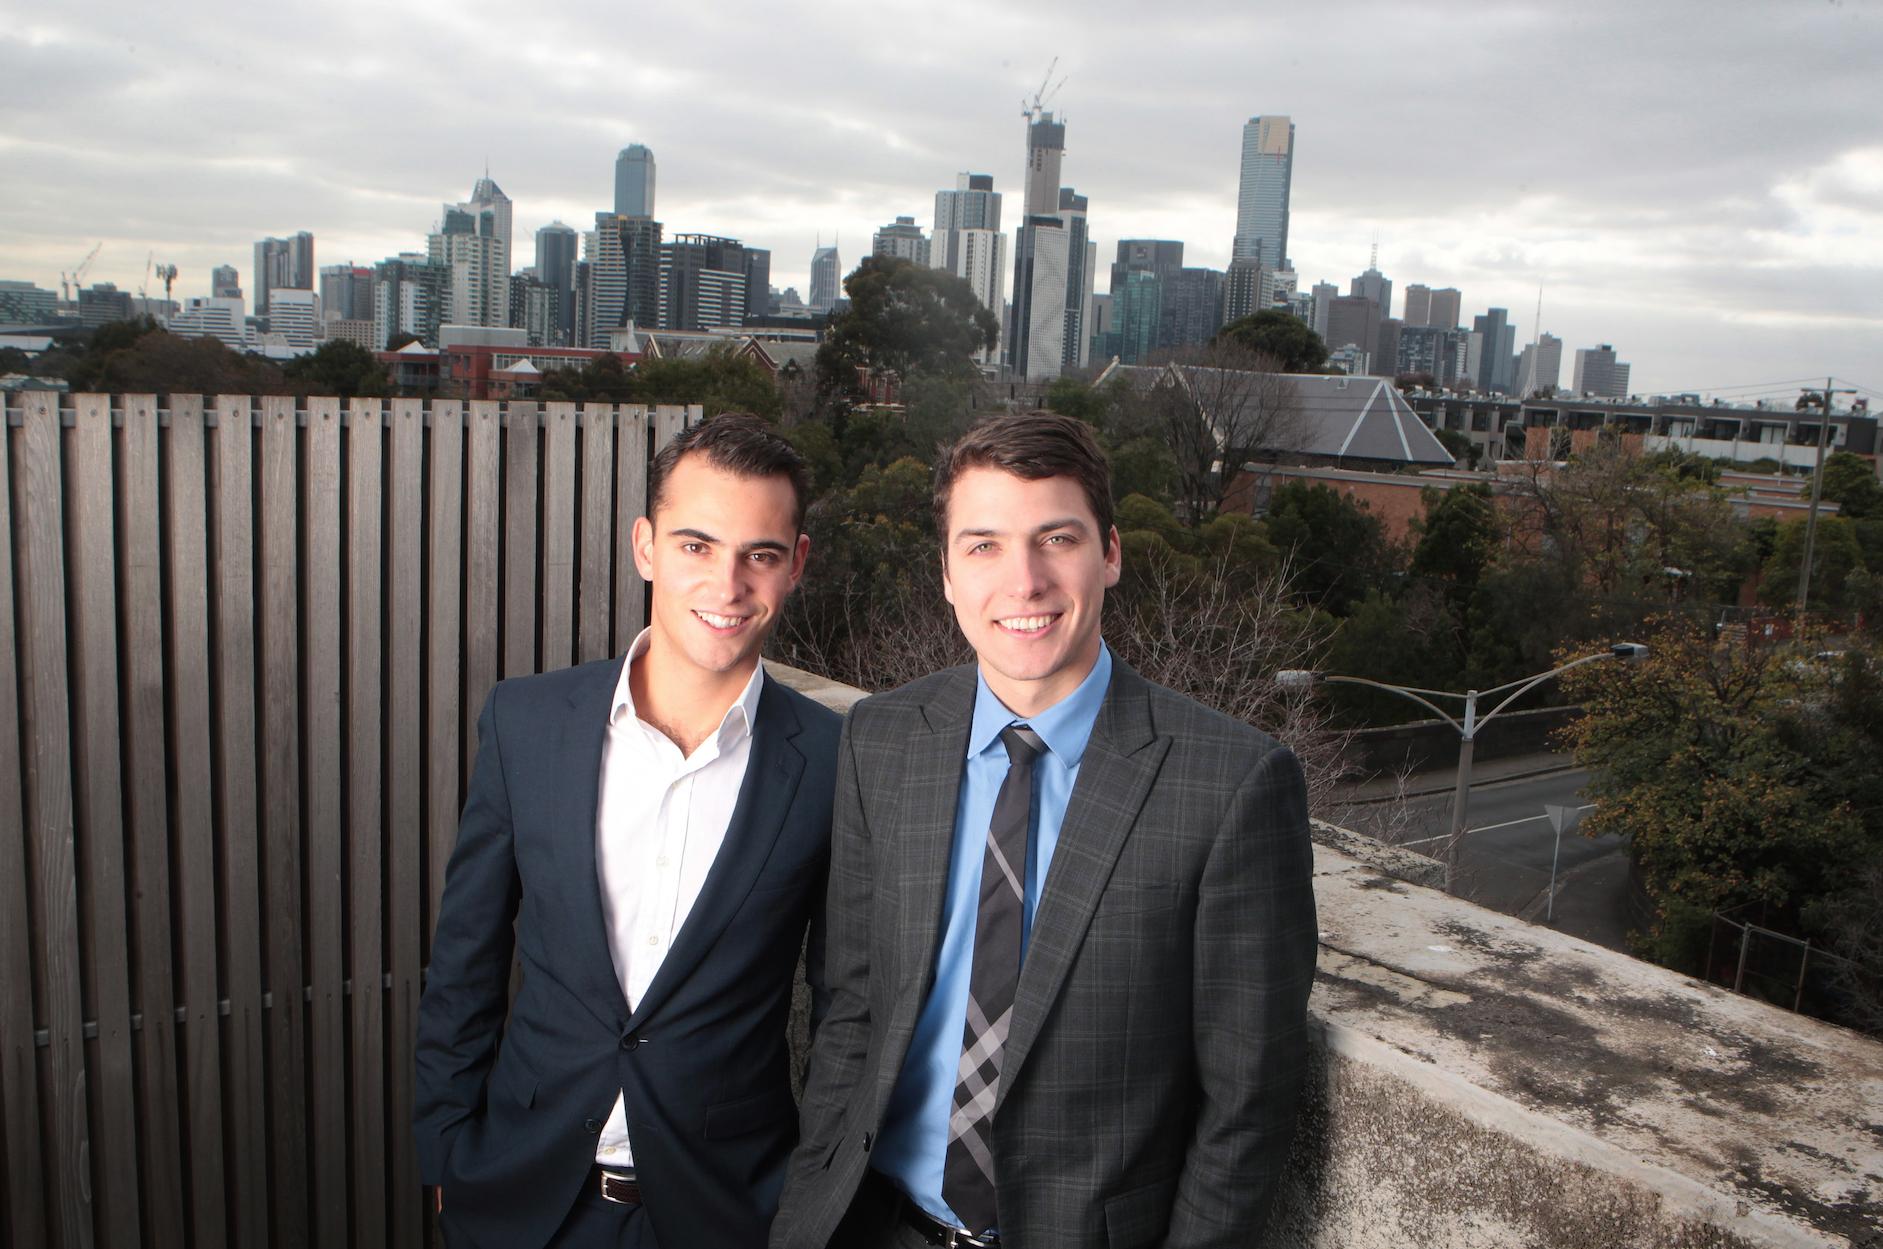 Apartment Developments is the new website by Jordan Catalano, son of Antony Catalano (Founder of Metro Media Publishing), and Tom Hywood, son of Fairfax CEO, Greg Hywood.